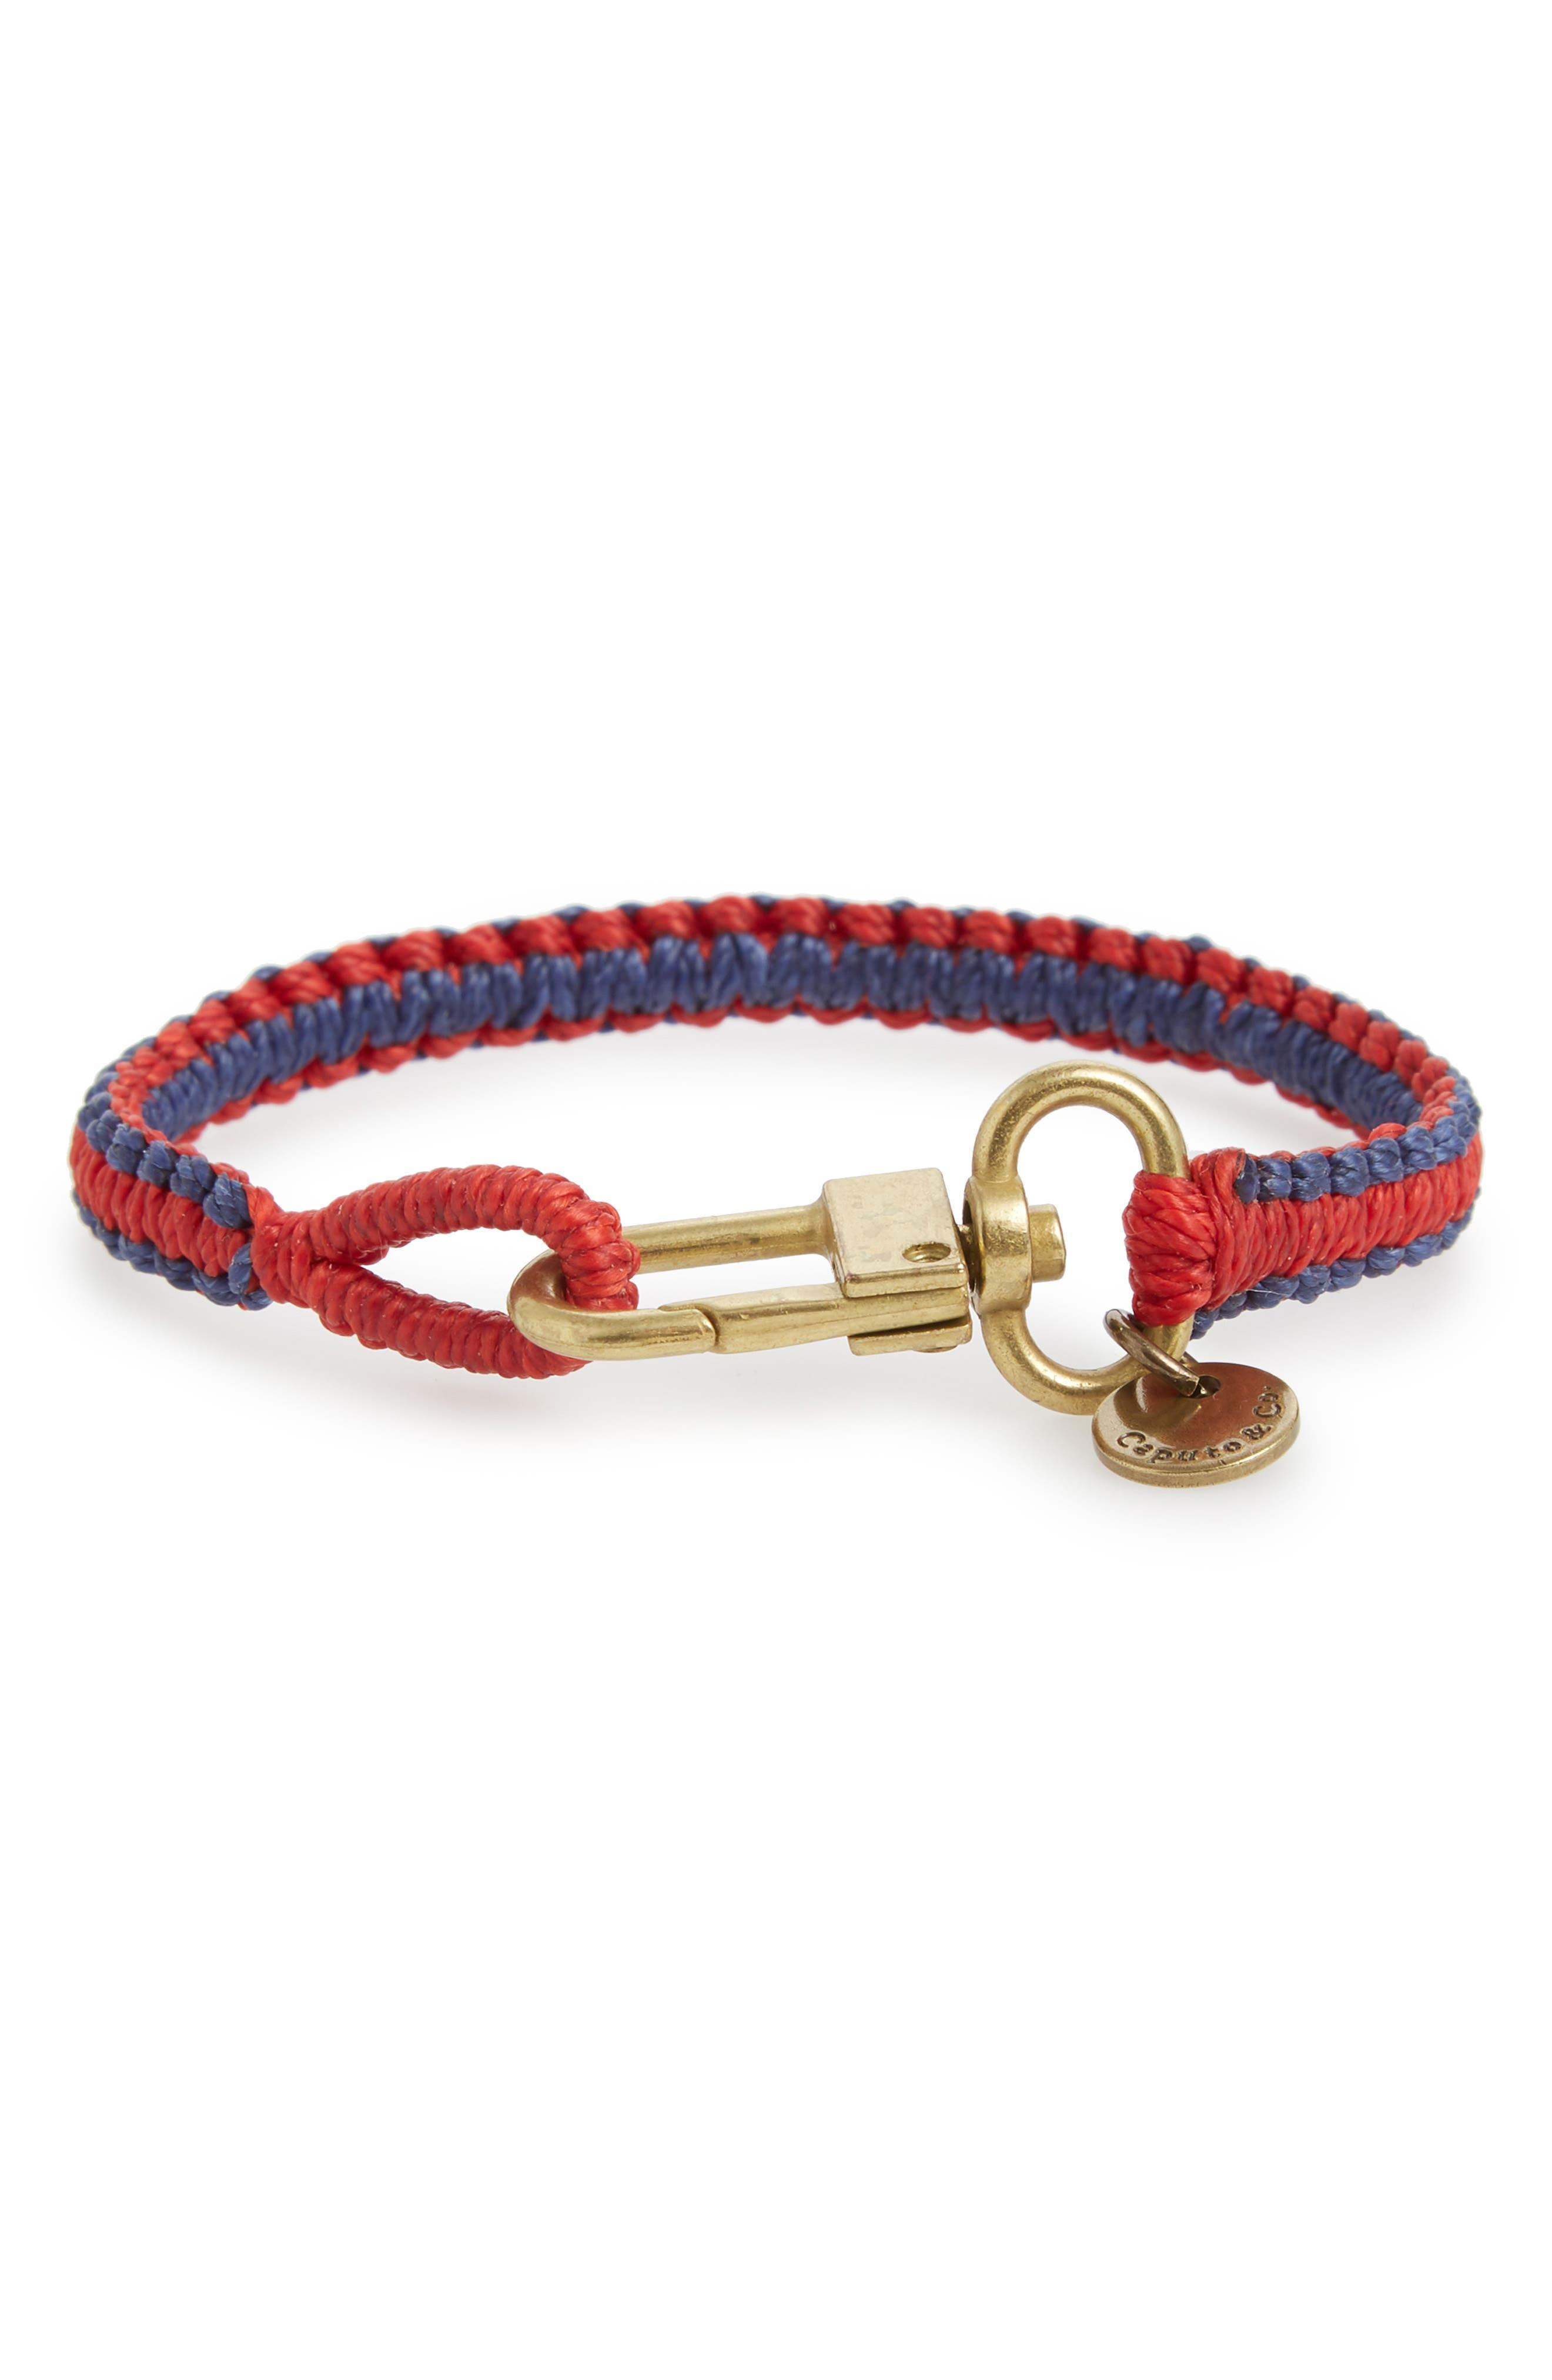 Reversible Bracelet,                             Main thumbnail 1, color,                             Red/ Navy